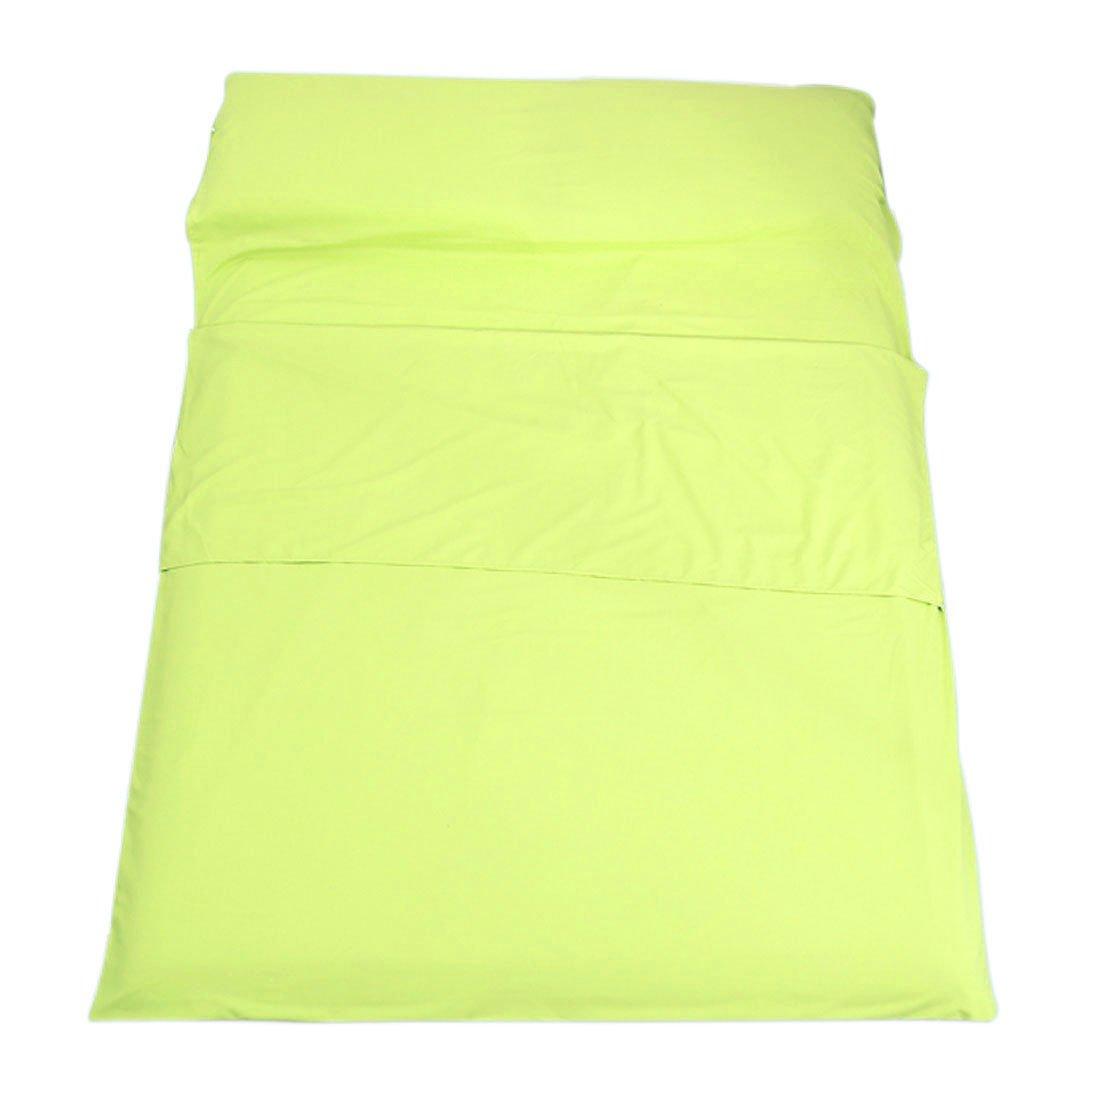 "enerhu Sleepingバッグライナーホテル大人用シート軽量ポータブル旅行キャンプ睡眠袋シングルダブルサイズ 160*210cm/63*83"" DOUBLE MA0554-5-3L/QLUS B07BLTM9BK 160*210cm/63*83"" DOUBLE,5# Yellow-green"